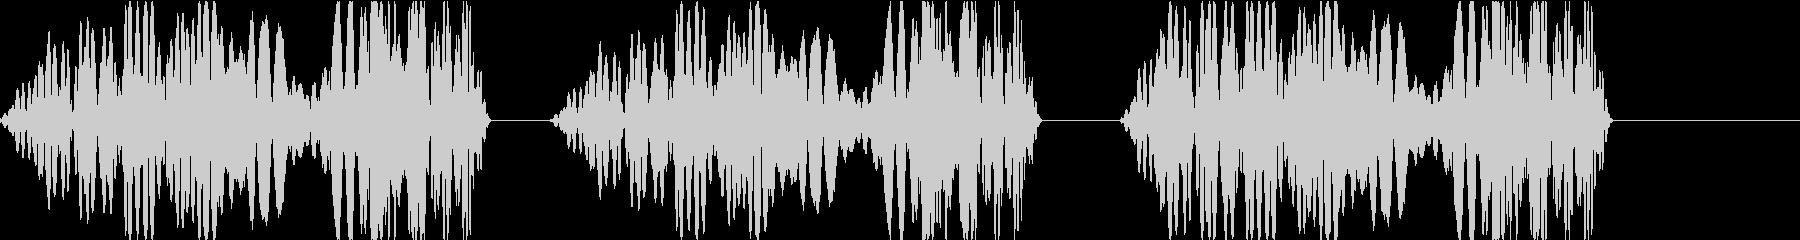 DJプレイ スクラッチ・ノイズ 256の未再生の波形